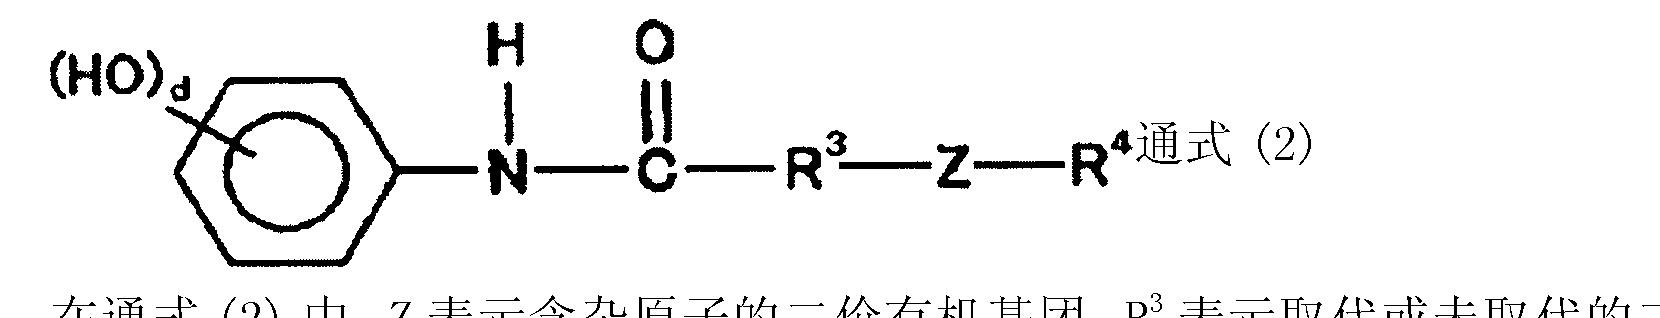 Figure CN102205756AD00172